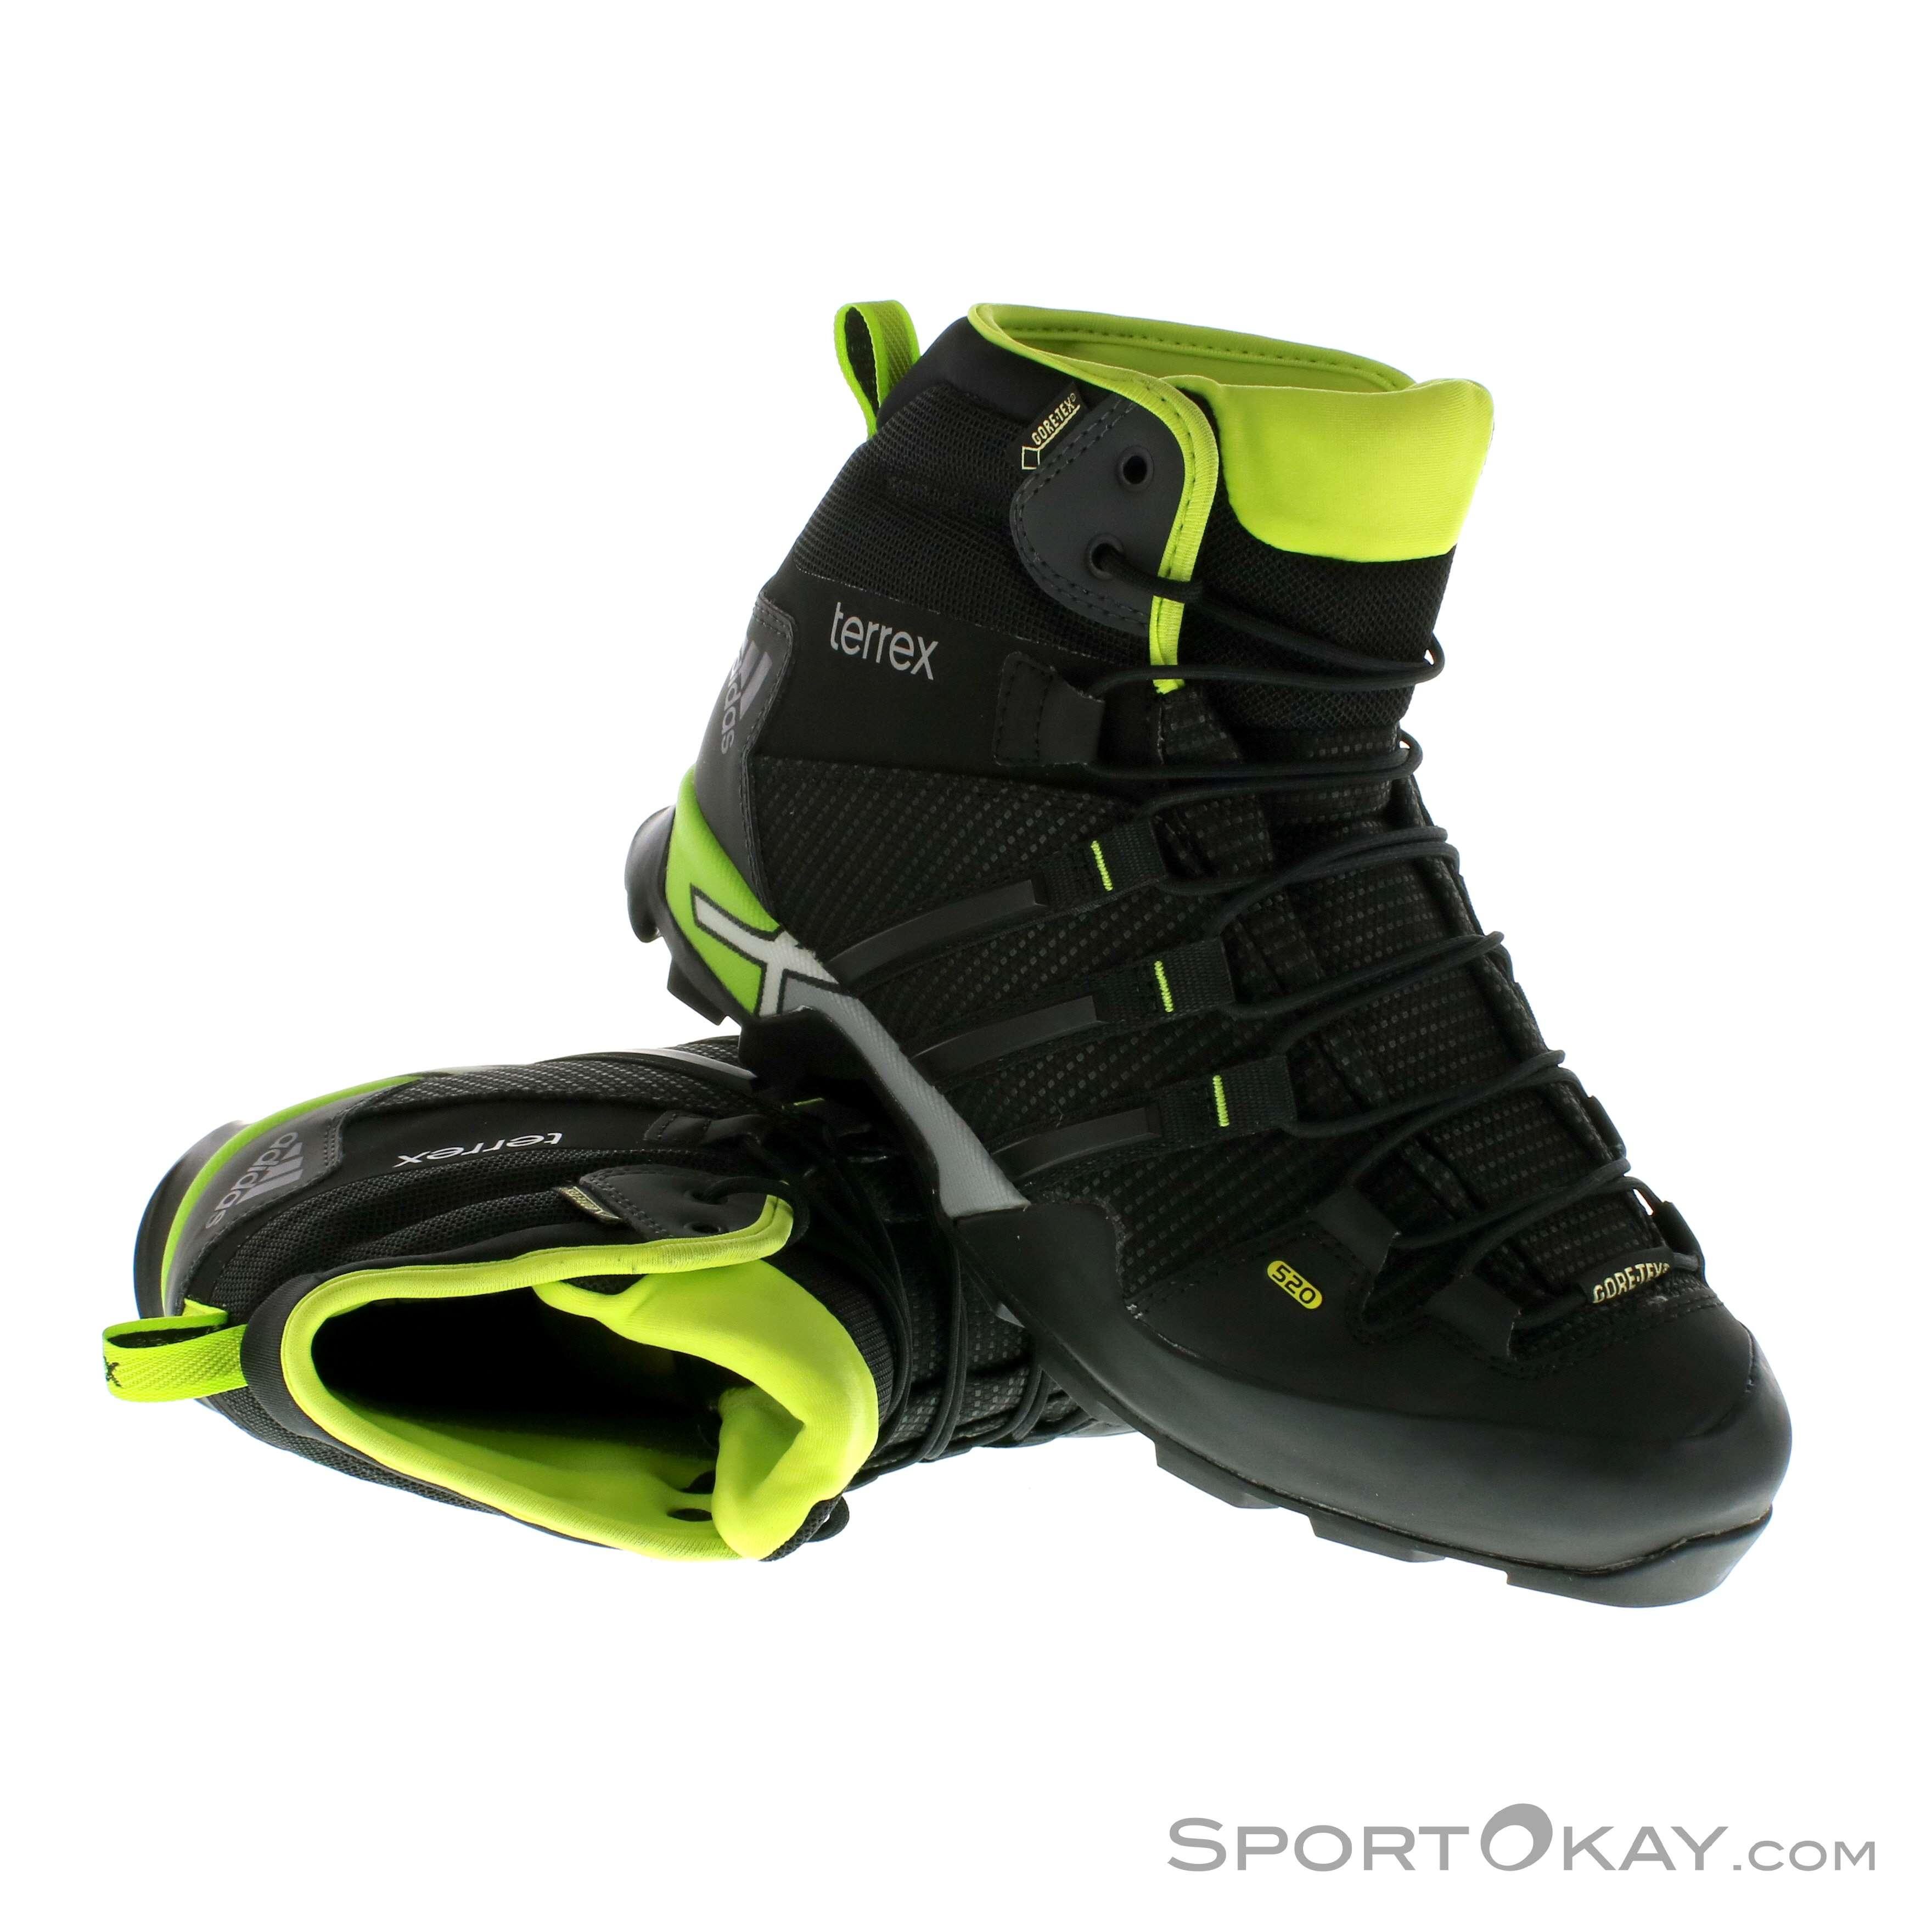 23588dcf0 adidas Terrex Scope High GTX Mens Trekking Shoes Gore-Tex - Trekking ...